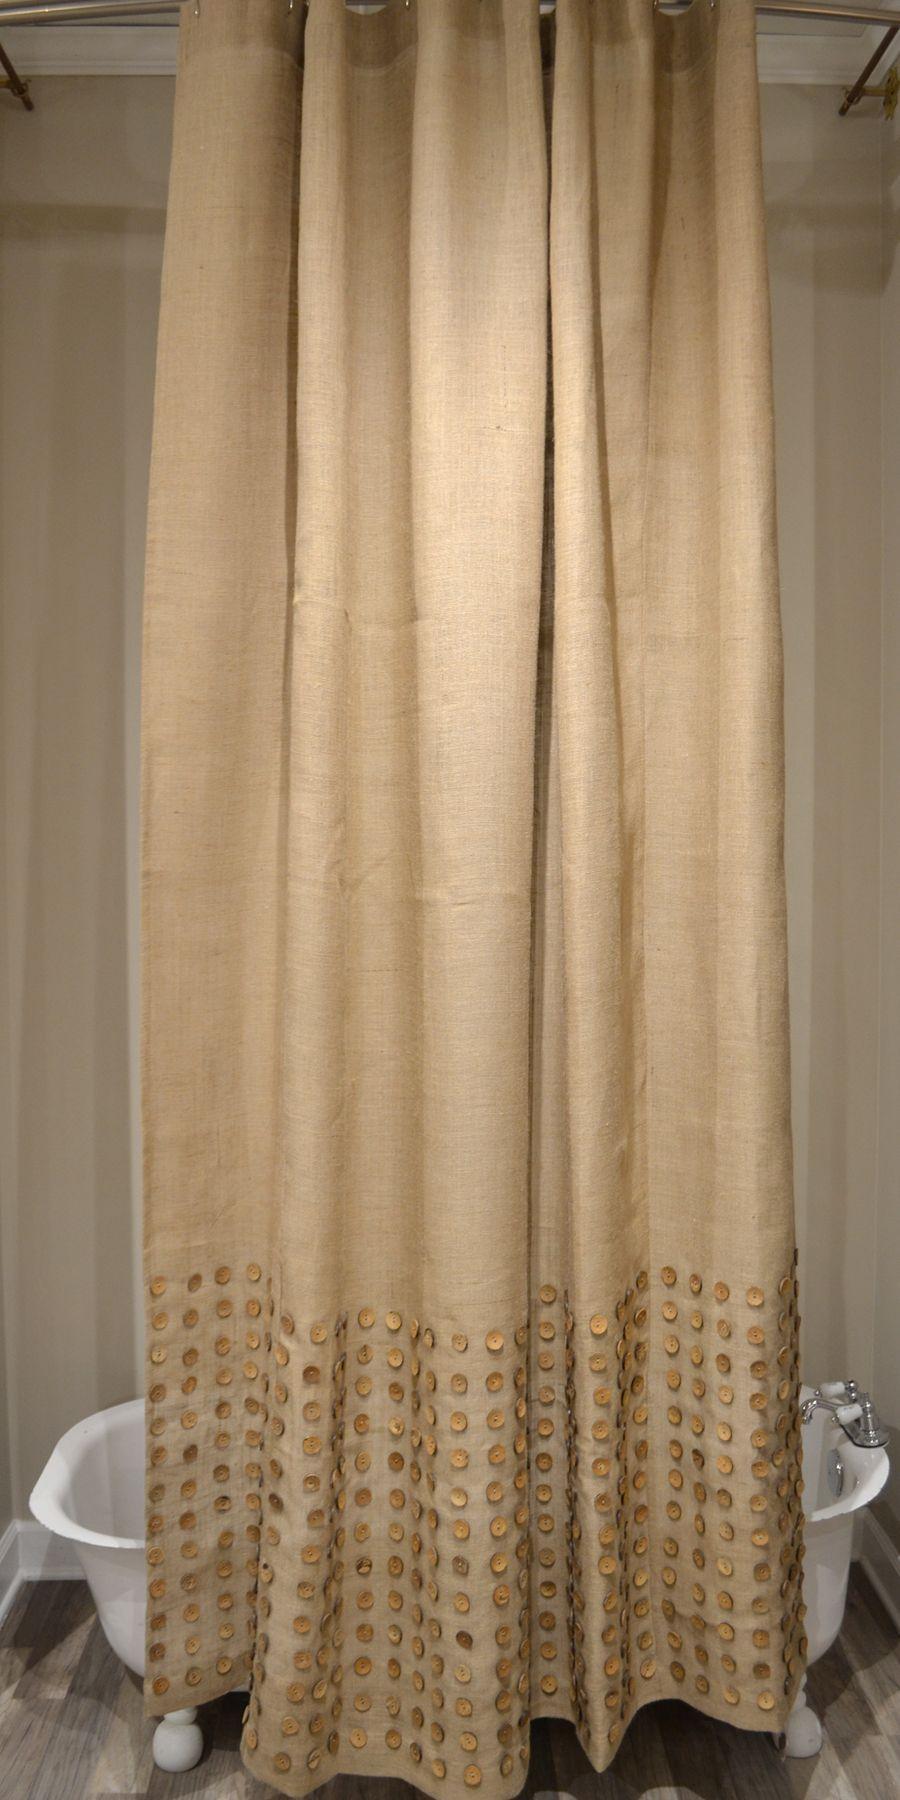 Natural shower curtain - Homthreads Burlap Band Shower Curtain Natural 72 X72 Decorating Ideas Pinterest Curtain Ideas Decorating And Bath